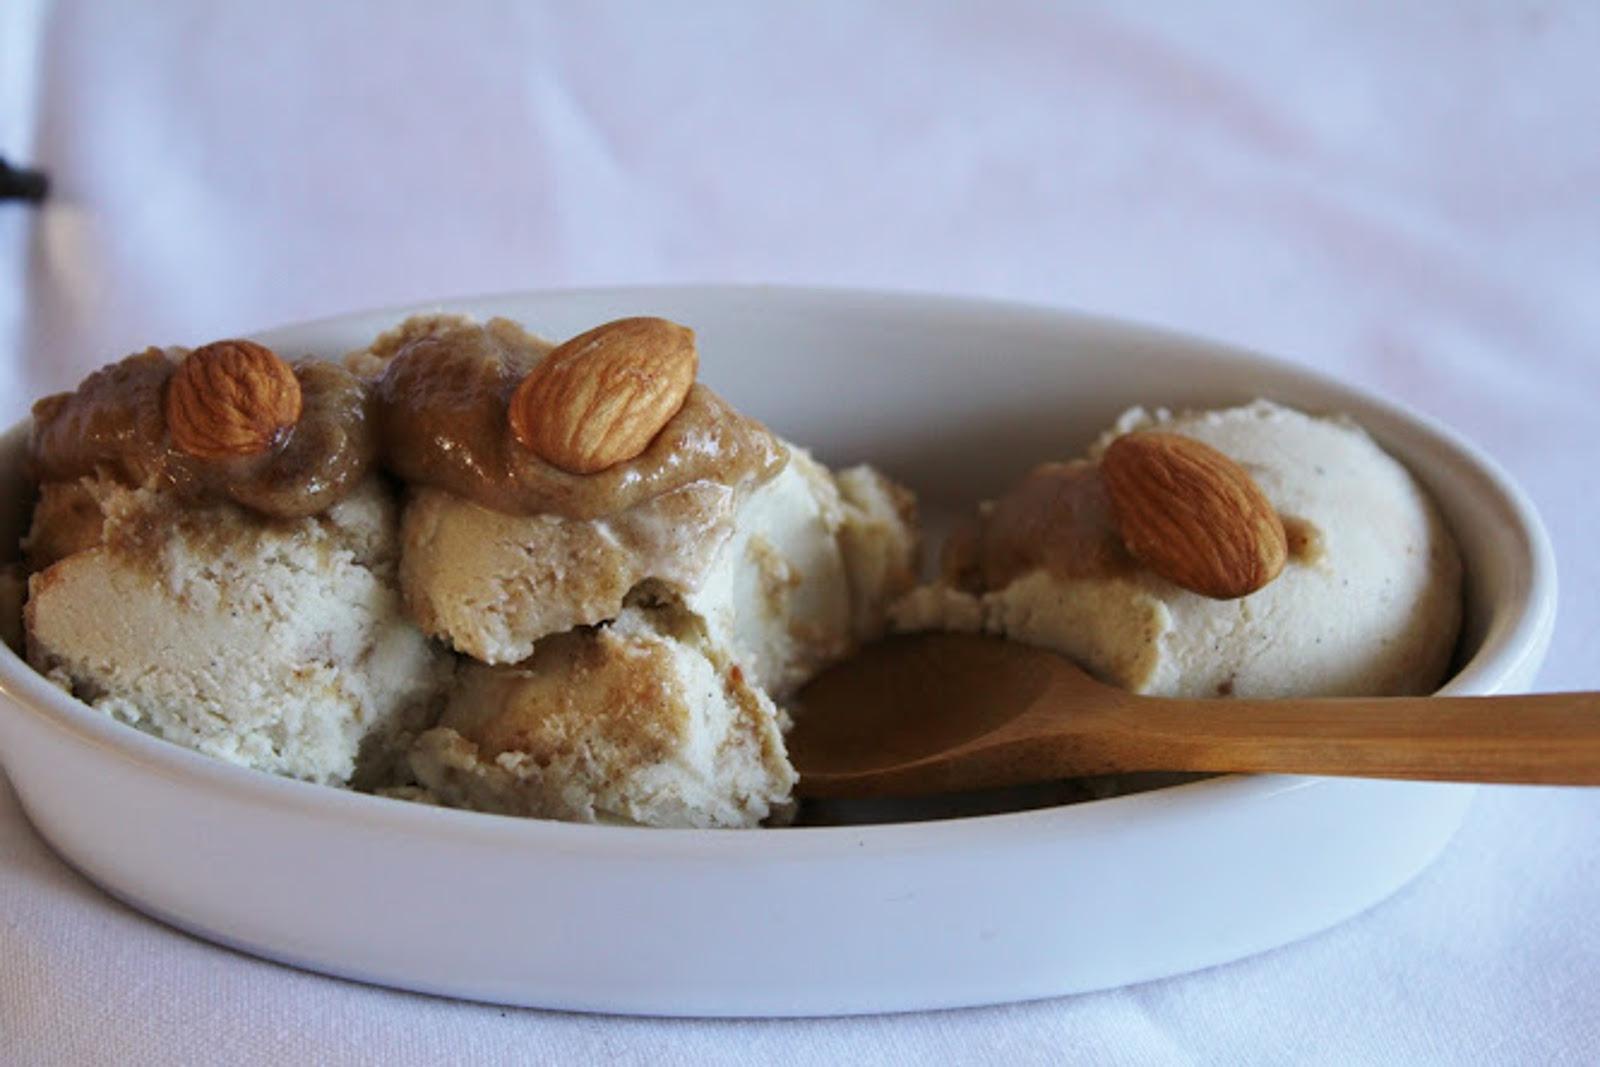 Olive Oil Ice Cream & Vanilla Coconut Ice Cream With Caramel